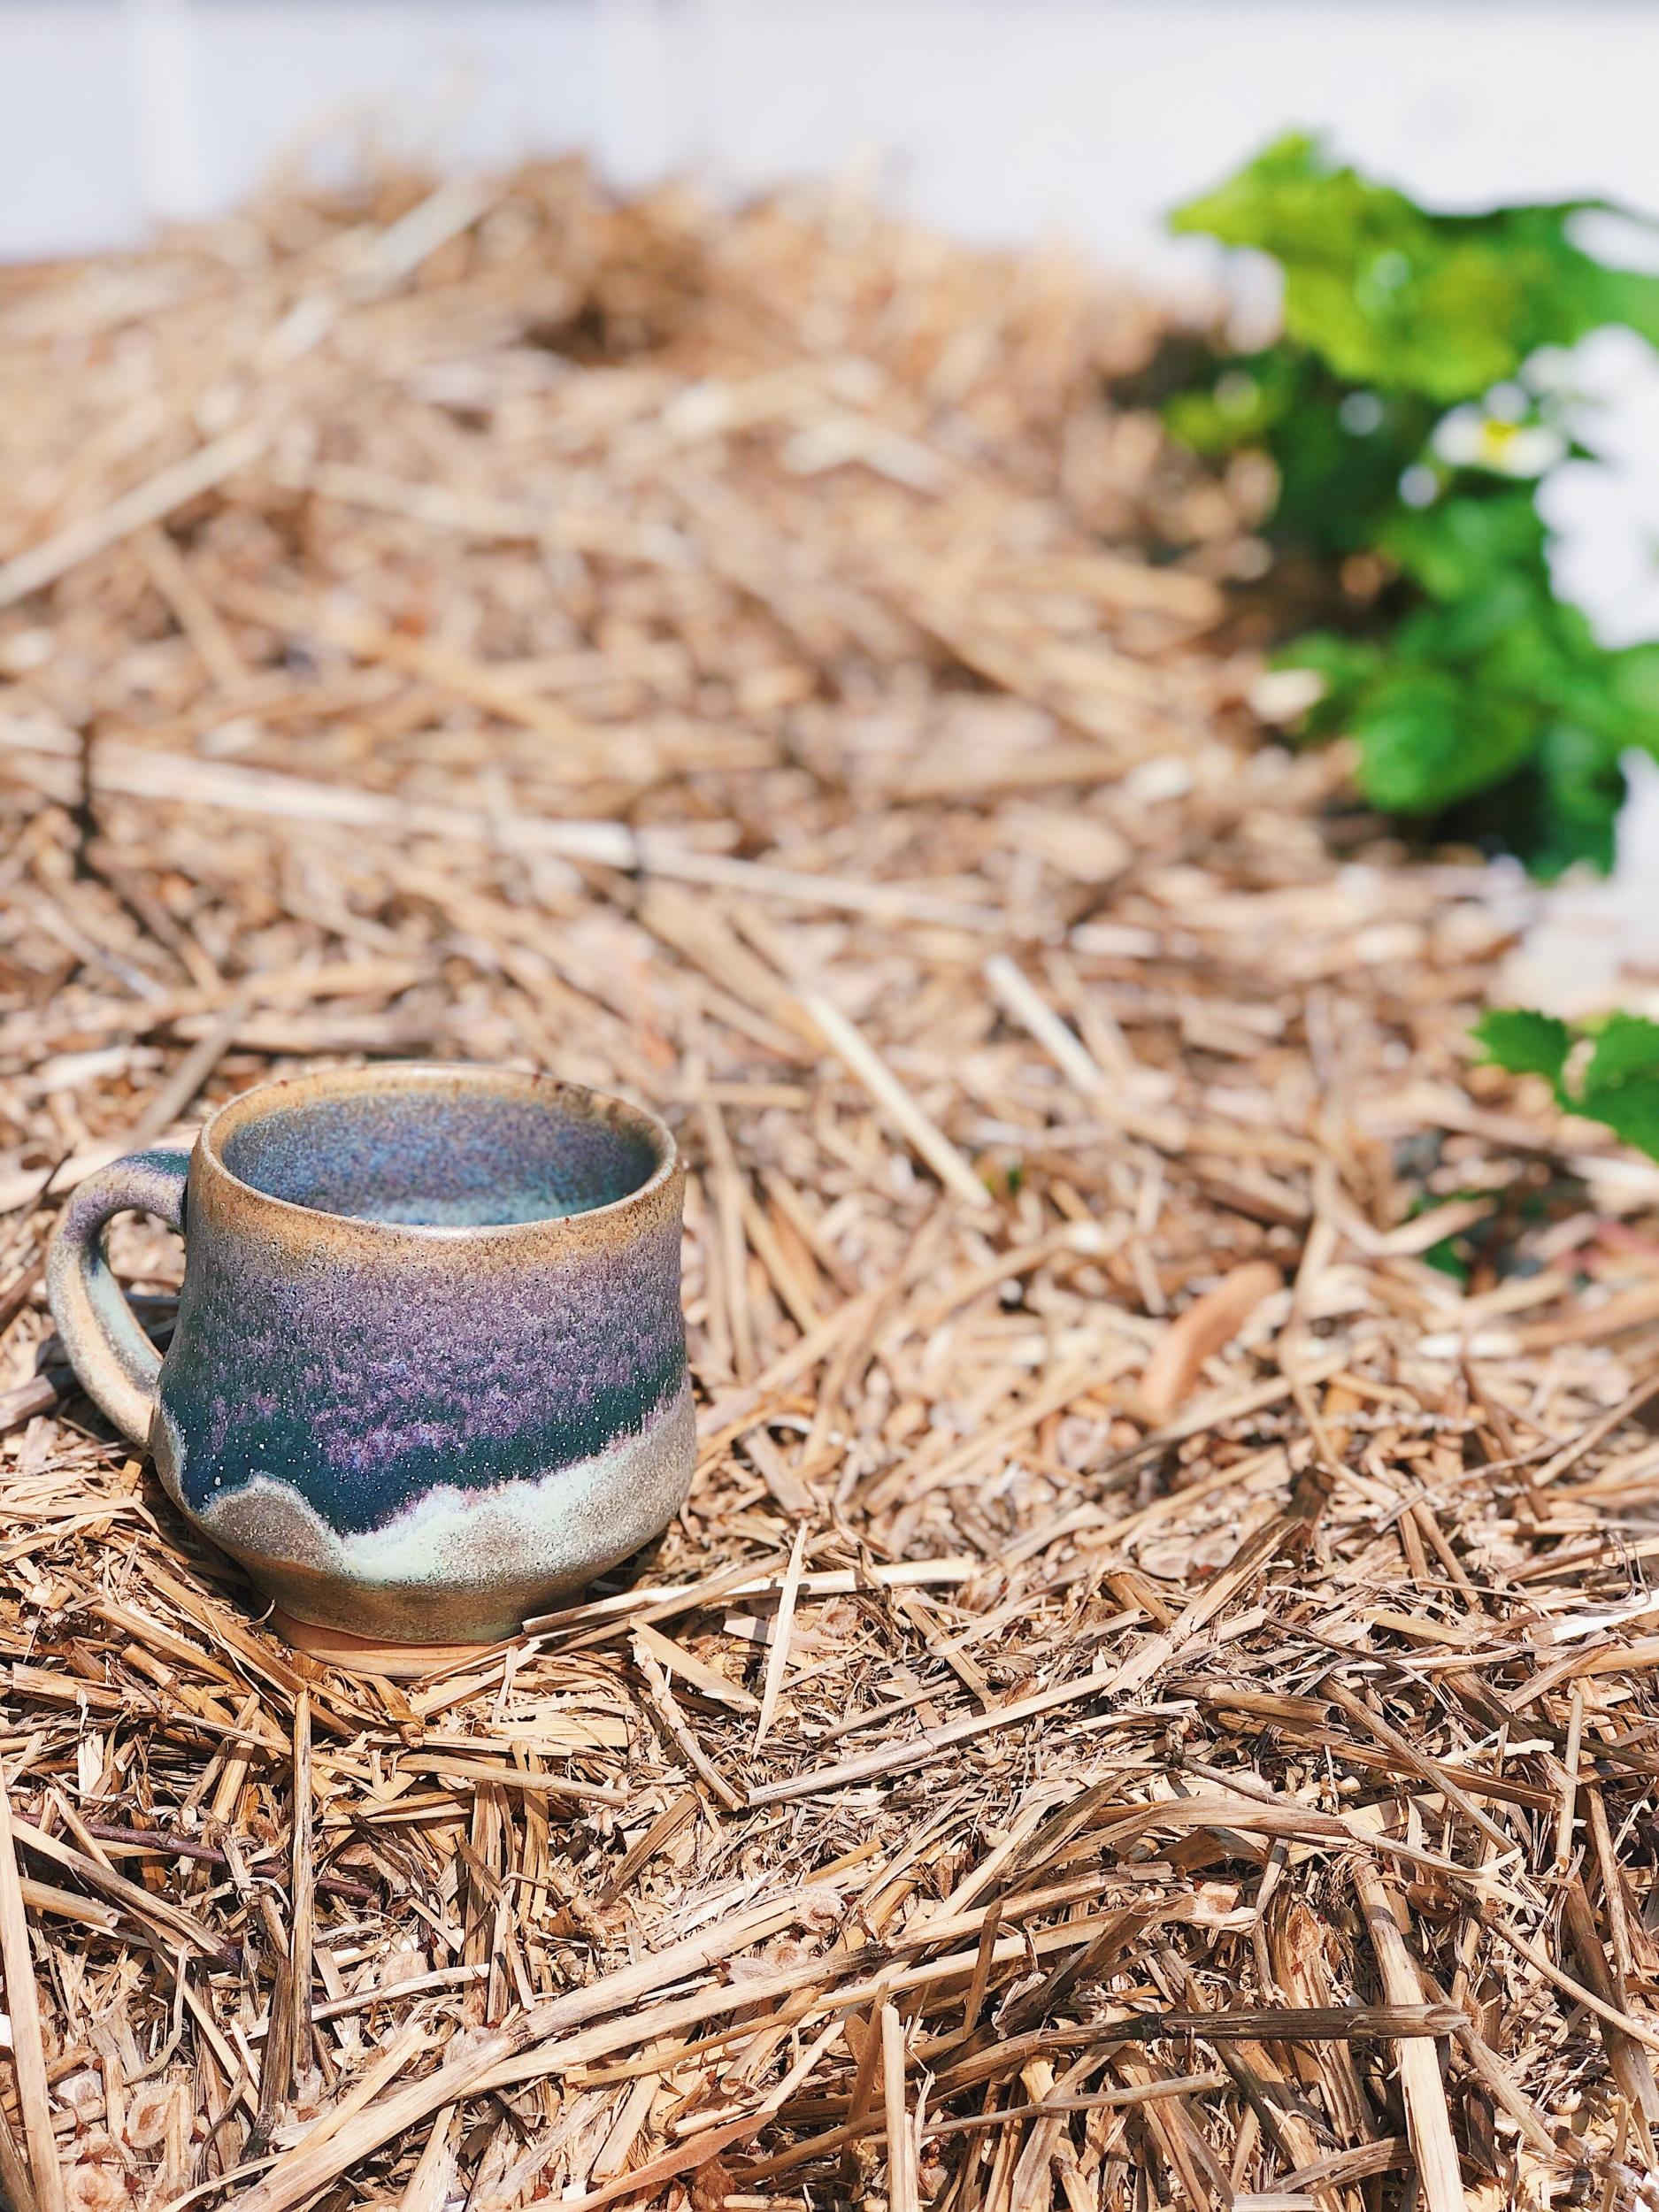 john_gazurian_pottery_mug_straw_reidy_creative.jpeg